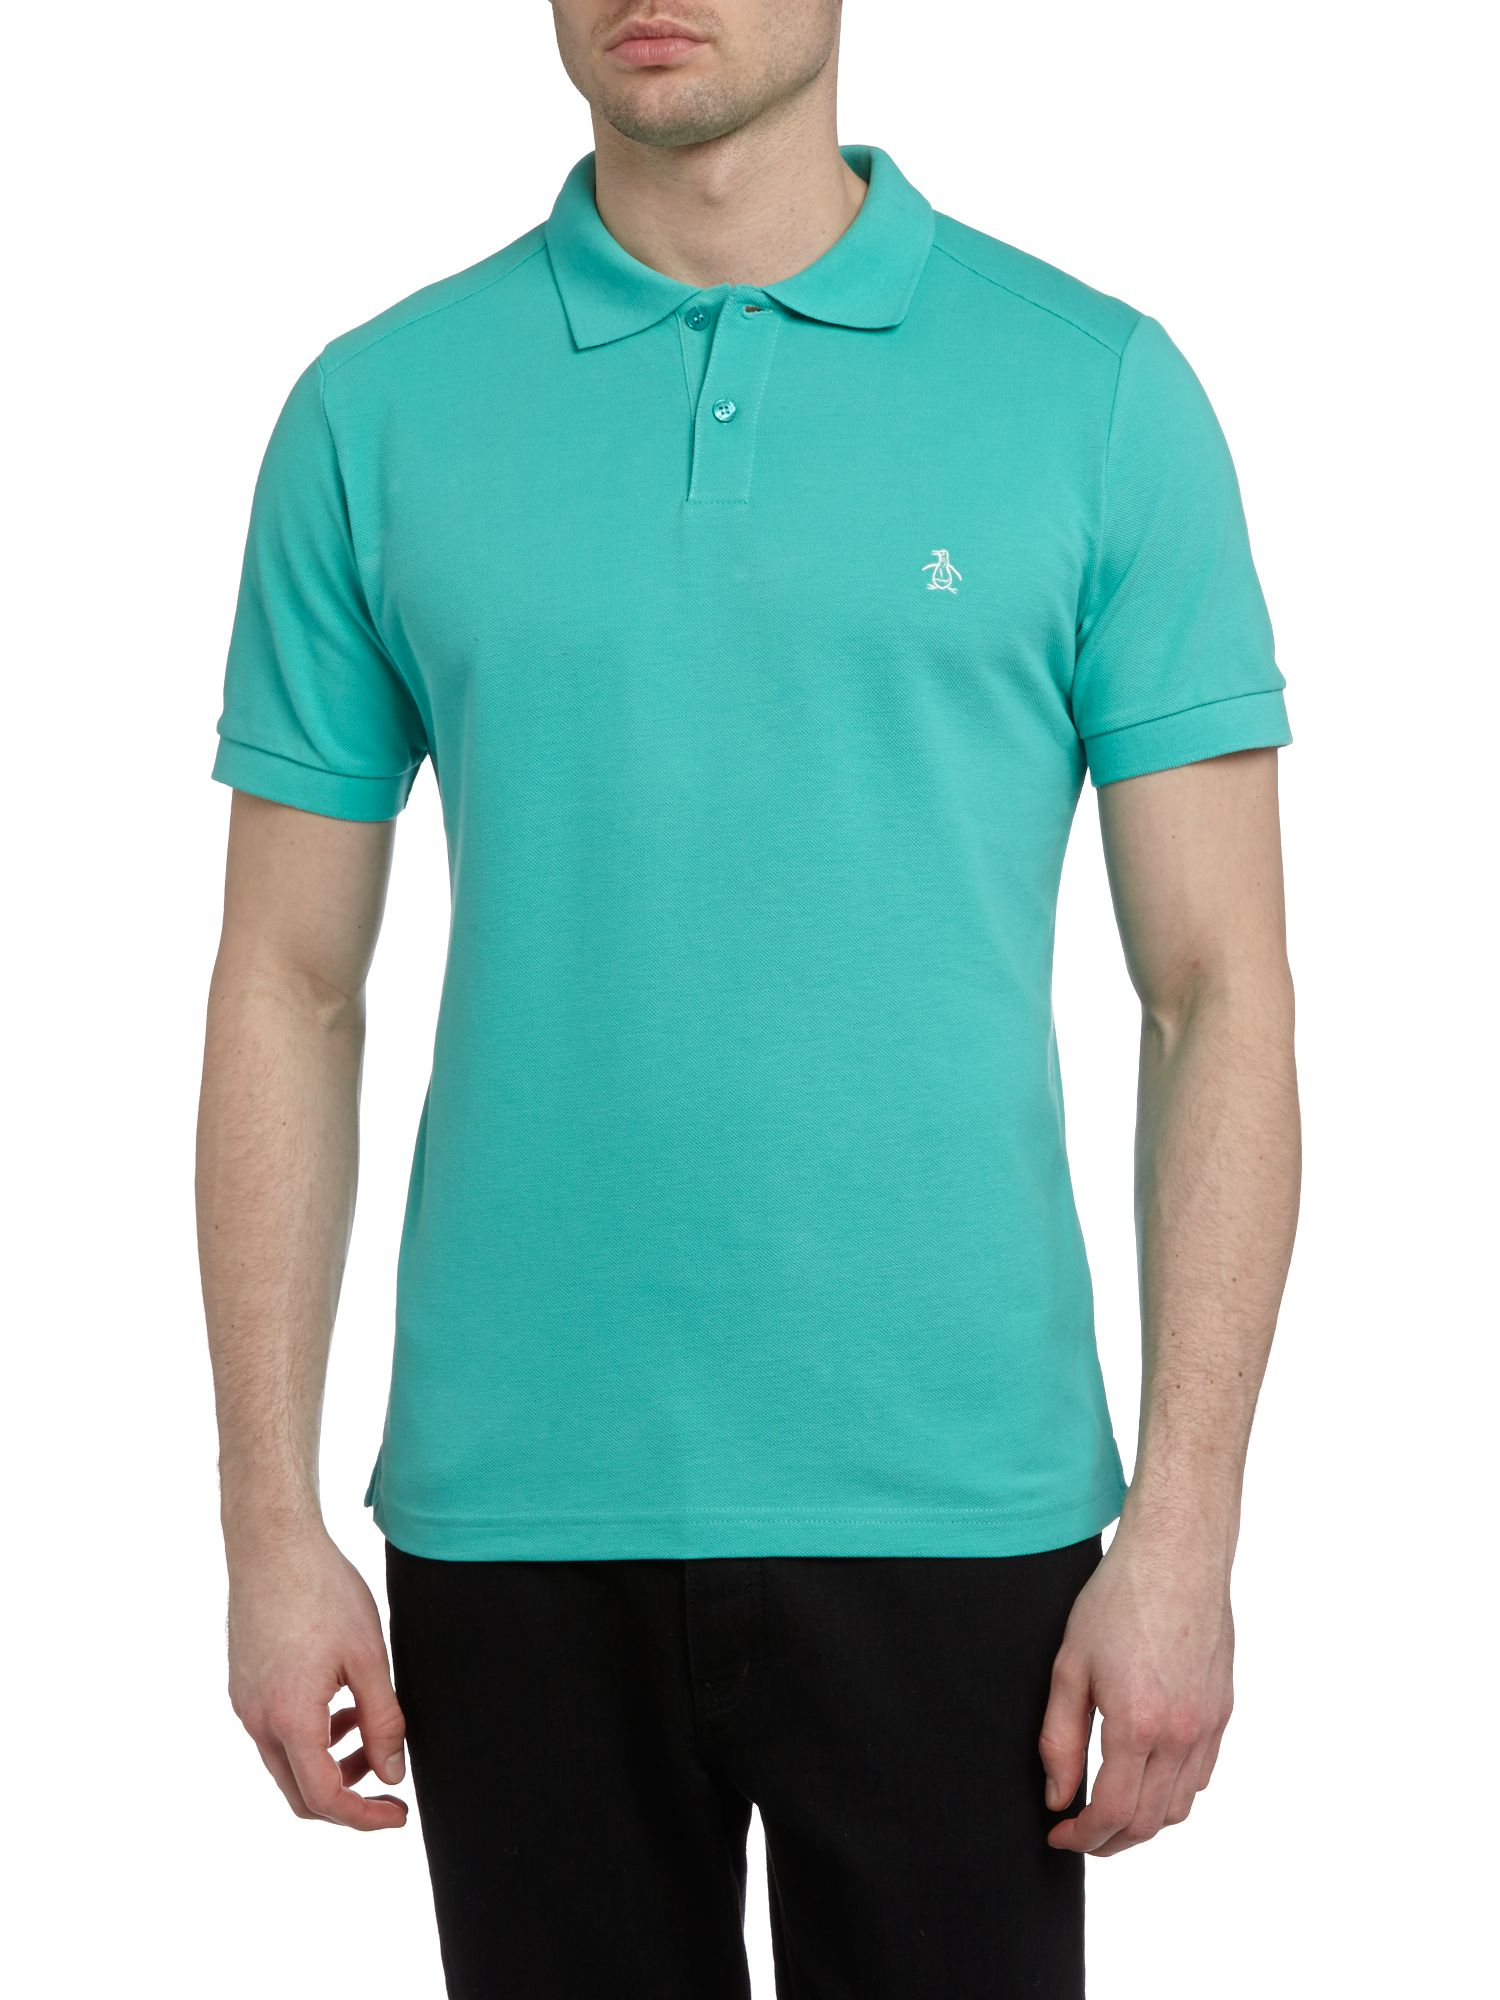 lyst original penguin slim fit daddy polo shirt in blue for men. Black Bedroom Furniture Sets. Home Design Ideas